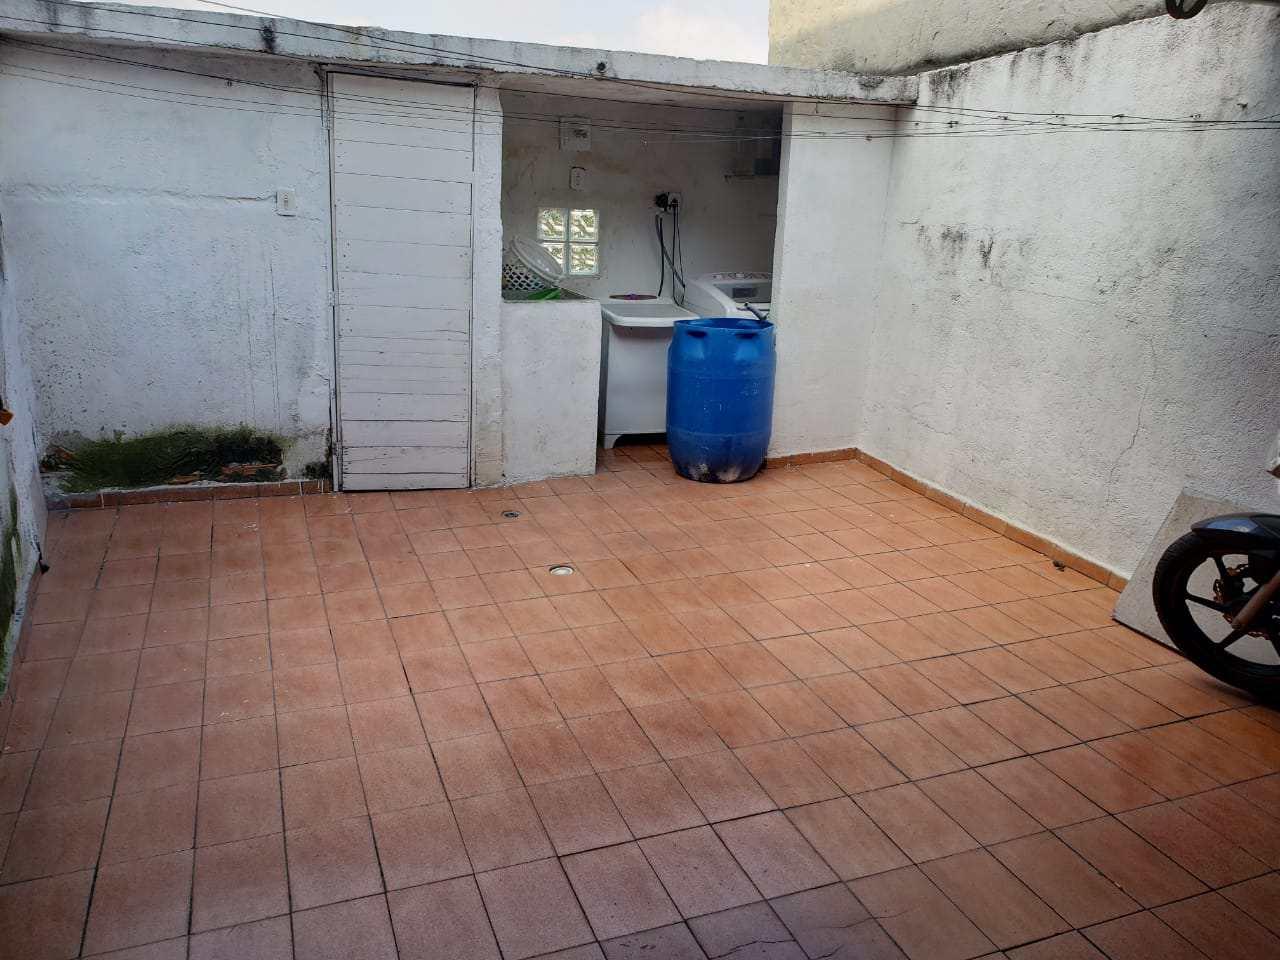 Casa com 2 dorms, Jardim Tietê, São Paulo - R$ 250 mil, Cod: 11333